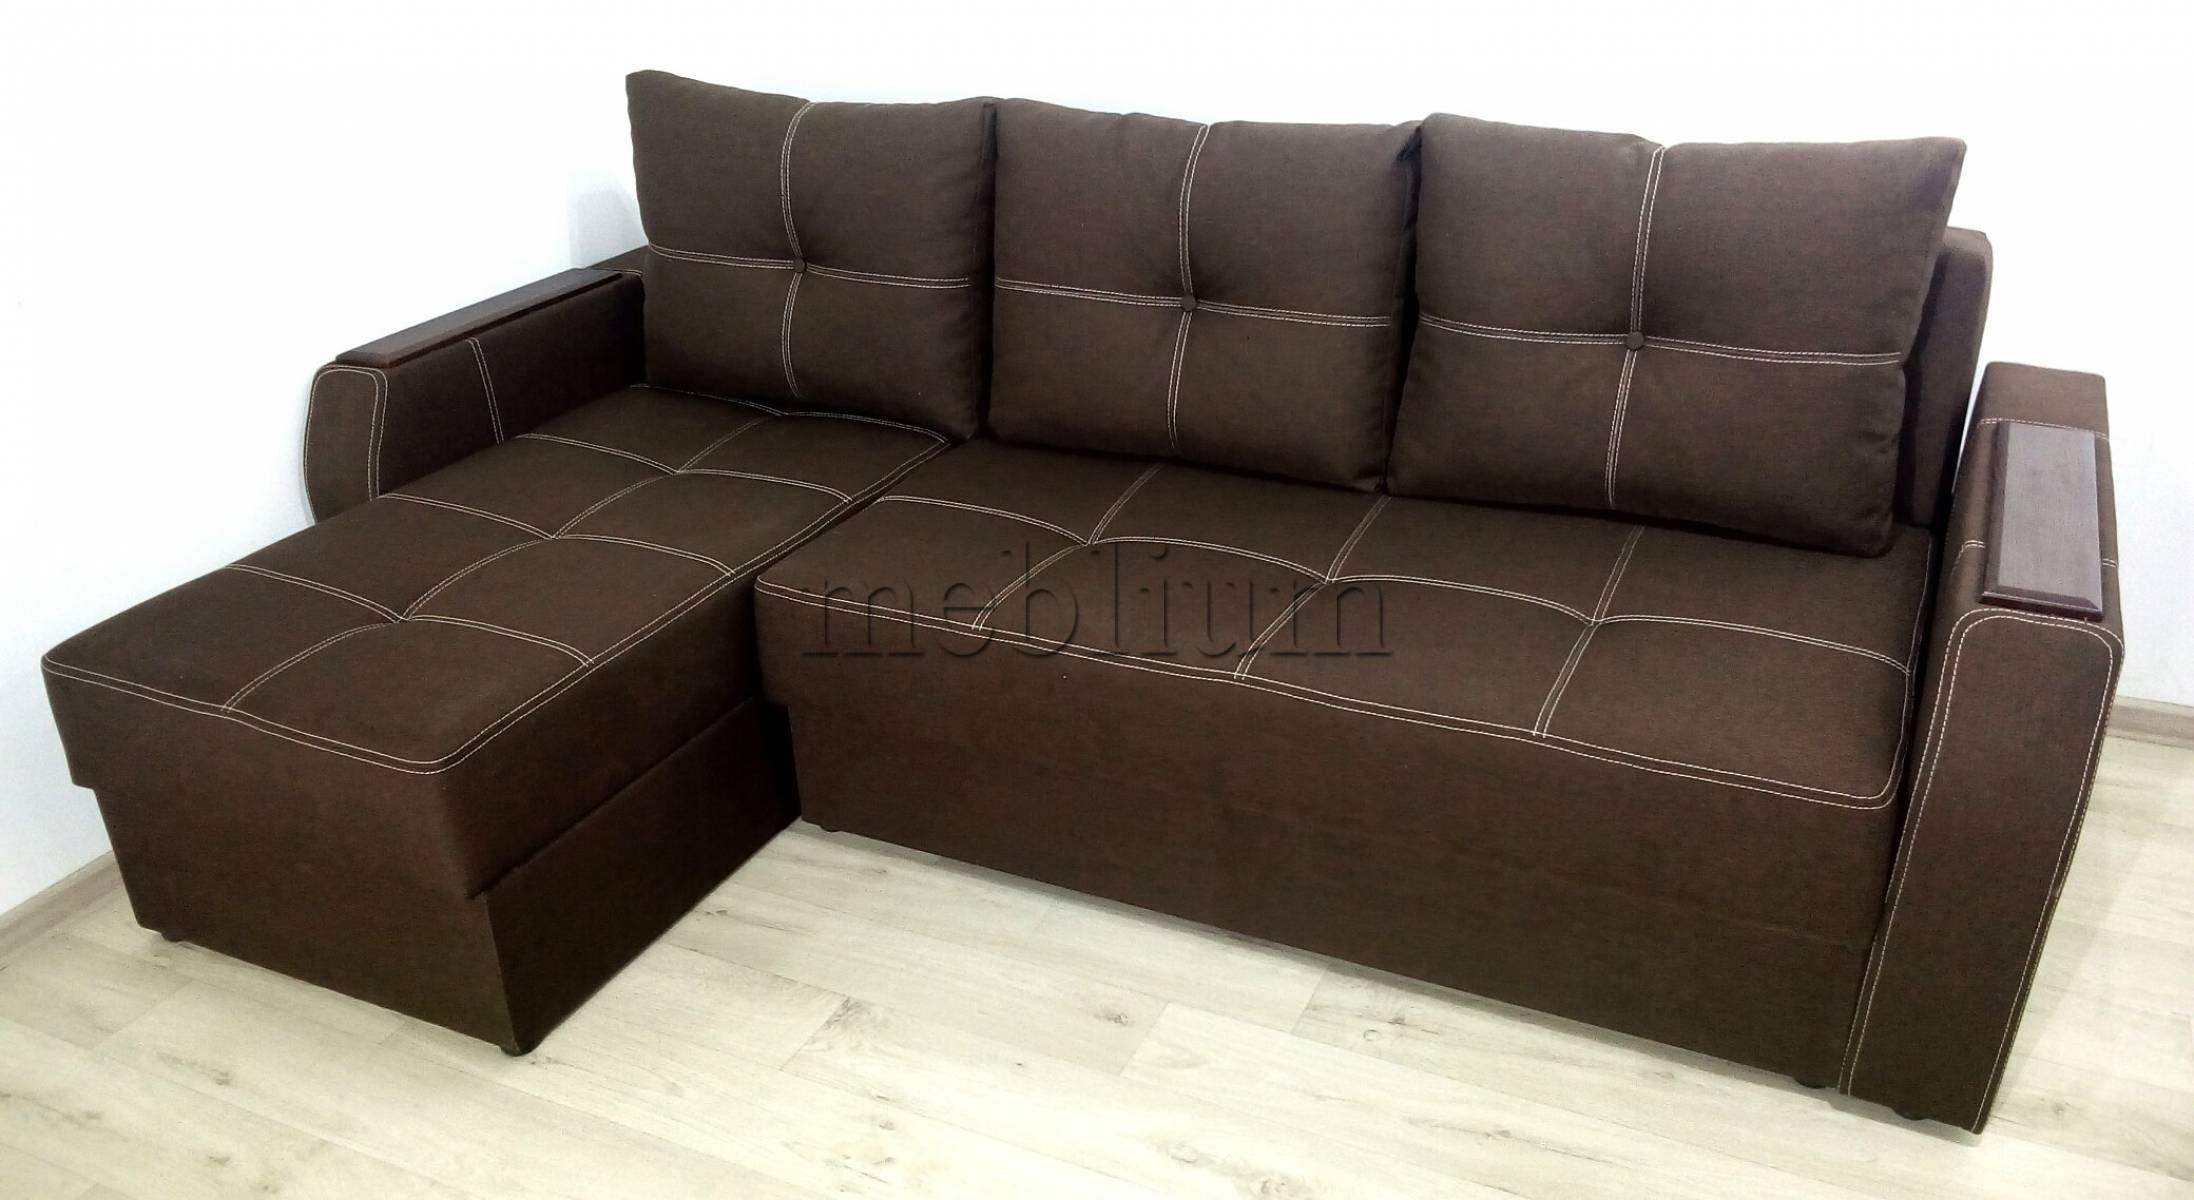 Угловой диван Брависсимо универсал -3 Ткань: Lux_12_Kor